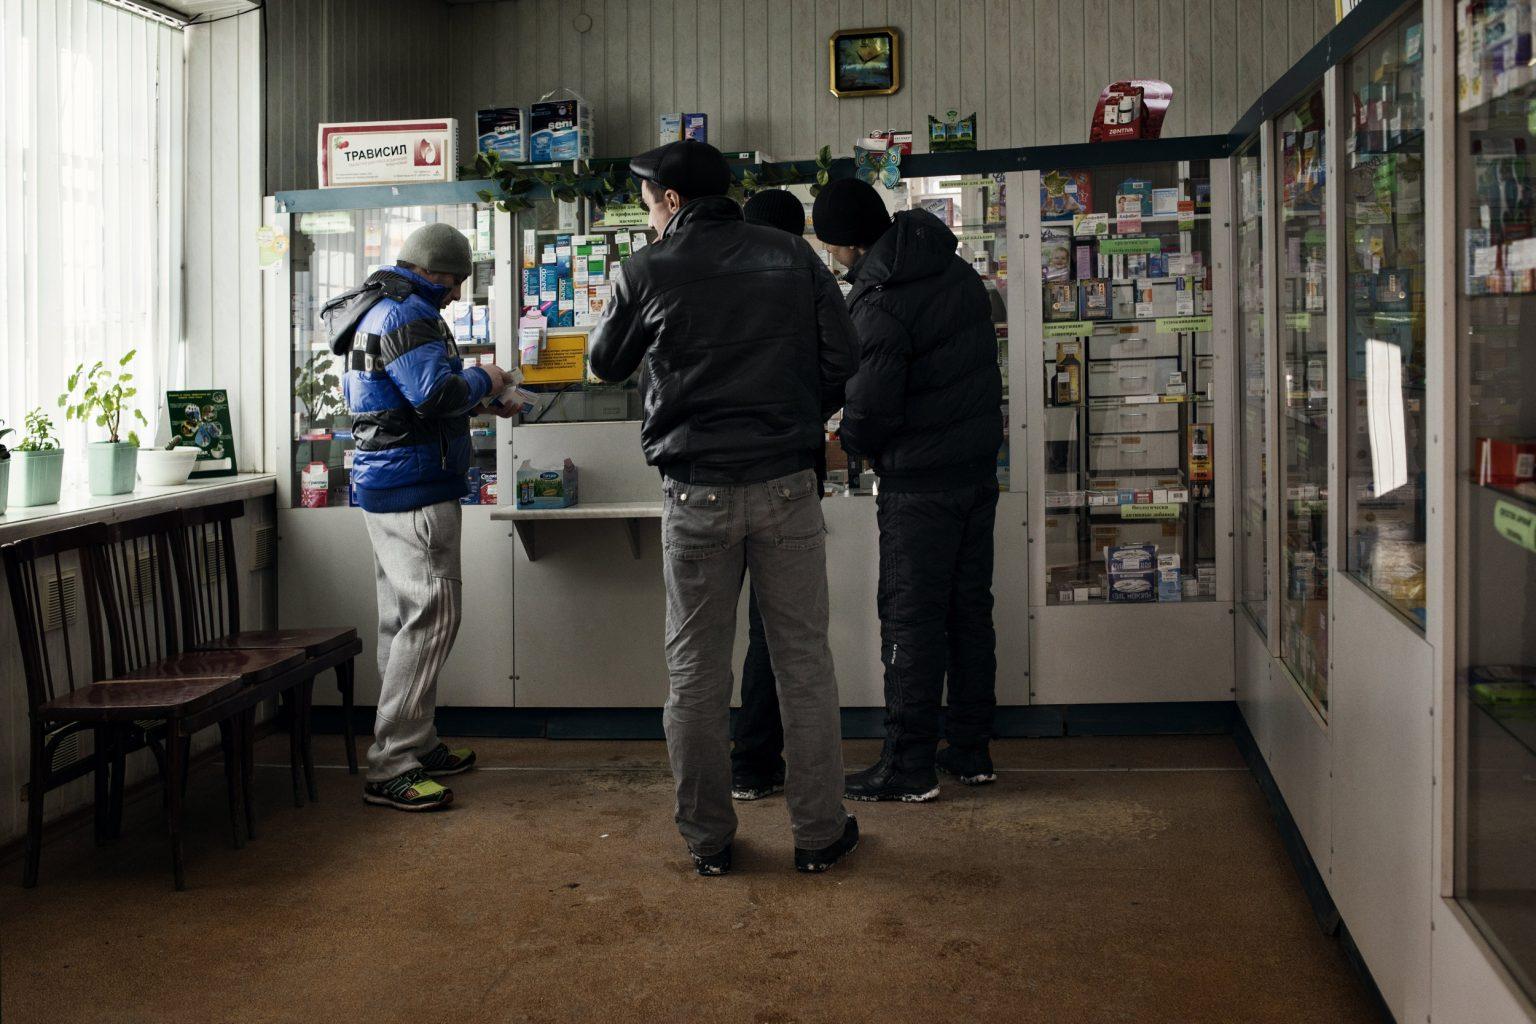 Yekaterinburg, Russia, March 2013 - Pavel in line to buy painkillers containing codeine in a pharmacy. >< Yekaterinburg, Russia, marzo 2013 - Pavel attende in fila all'interno di una farmacia per acquistare analgesici contenenti codeina.